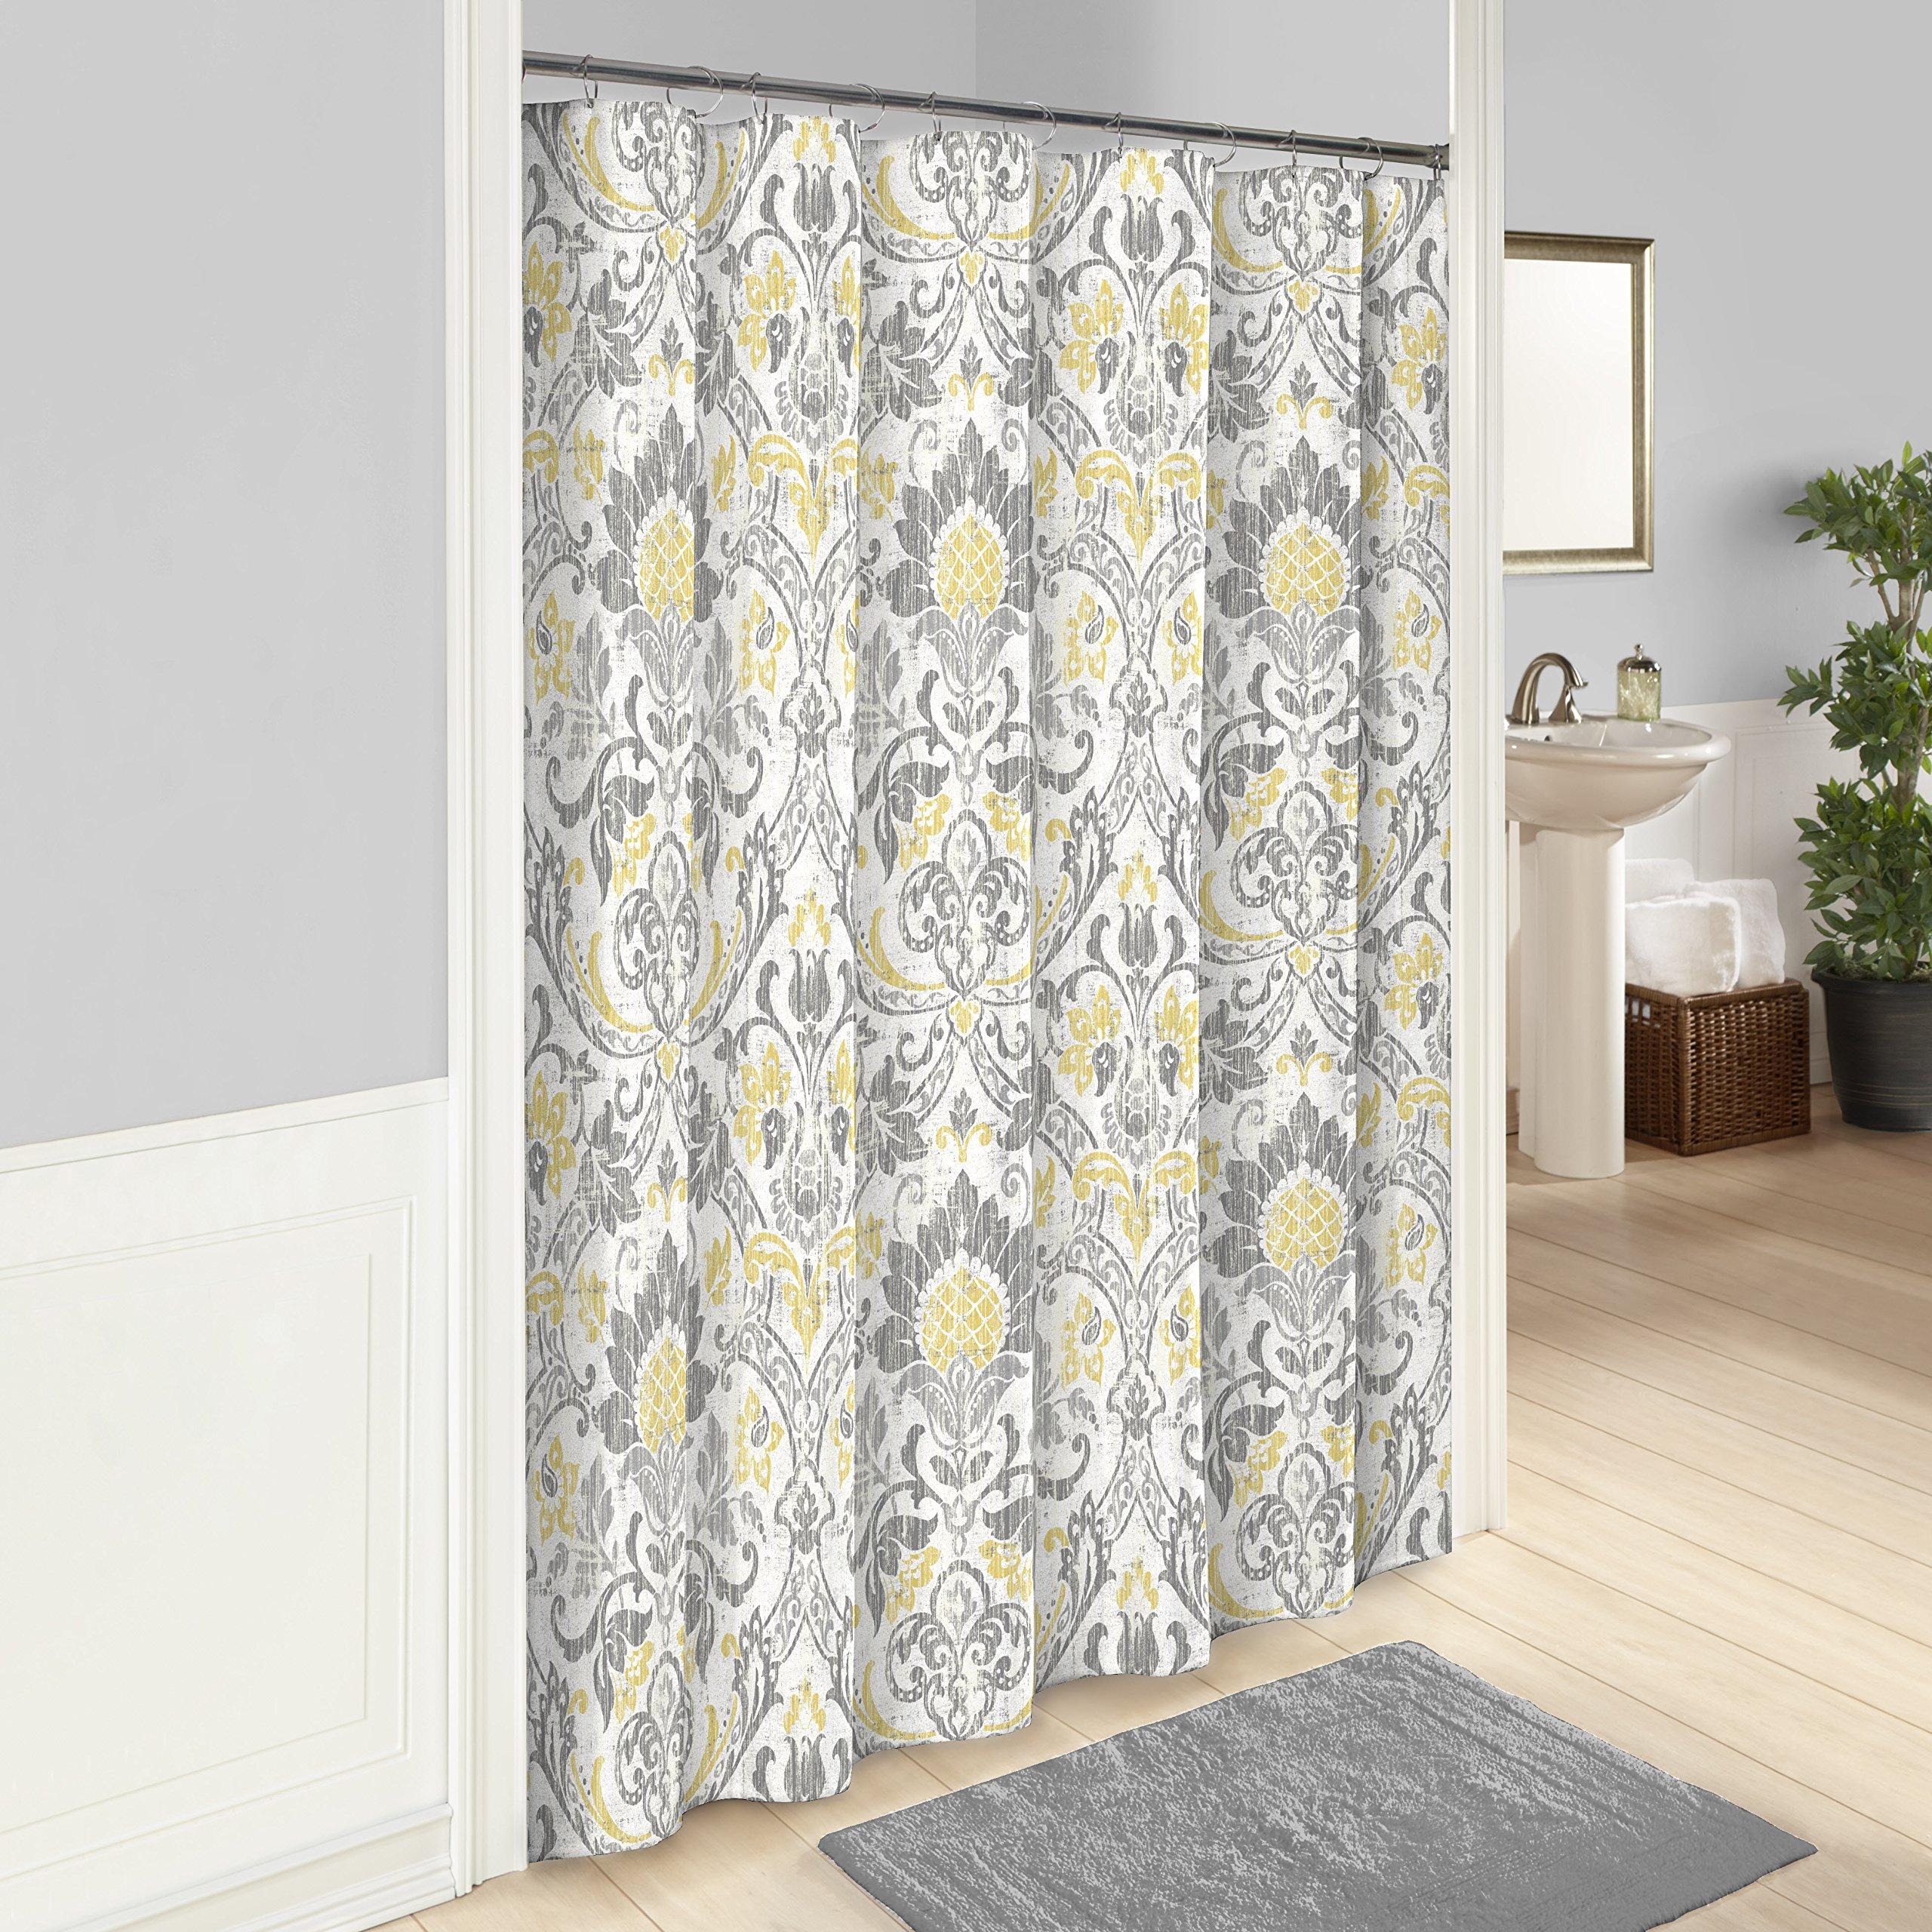 MARBLE HILL Shower Curtains for Bathroom - Rayna 72'' x 72'' Machine Washable Bath Curtains, Gray